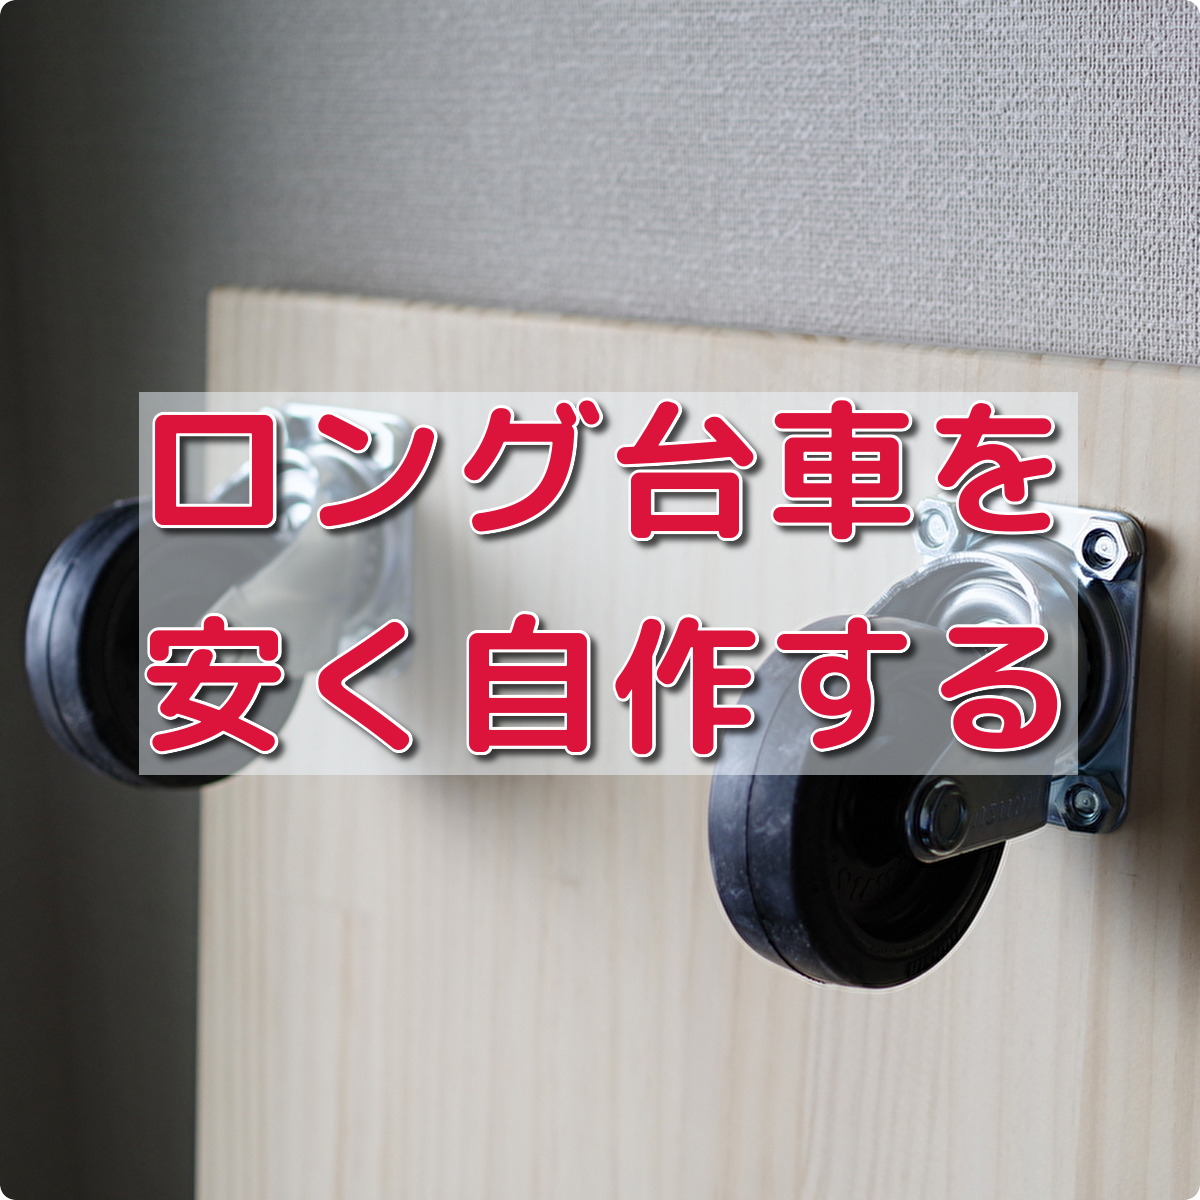 f:id:h_yukichi:20200322144318p:plain